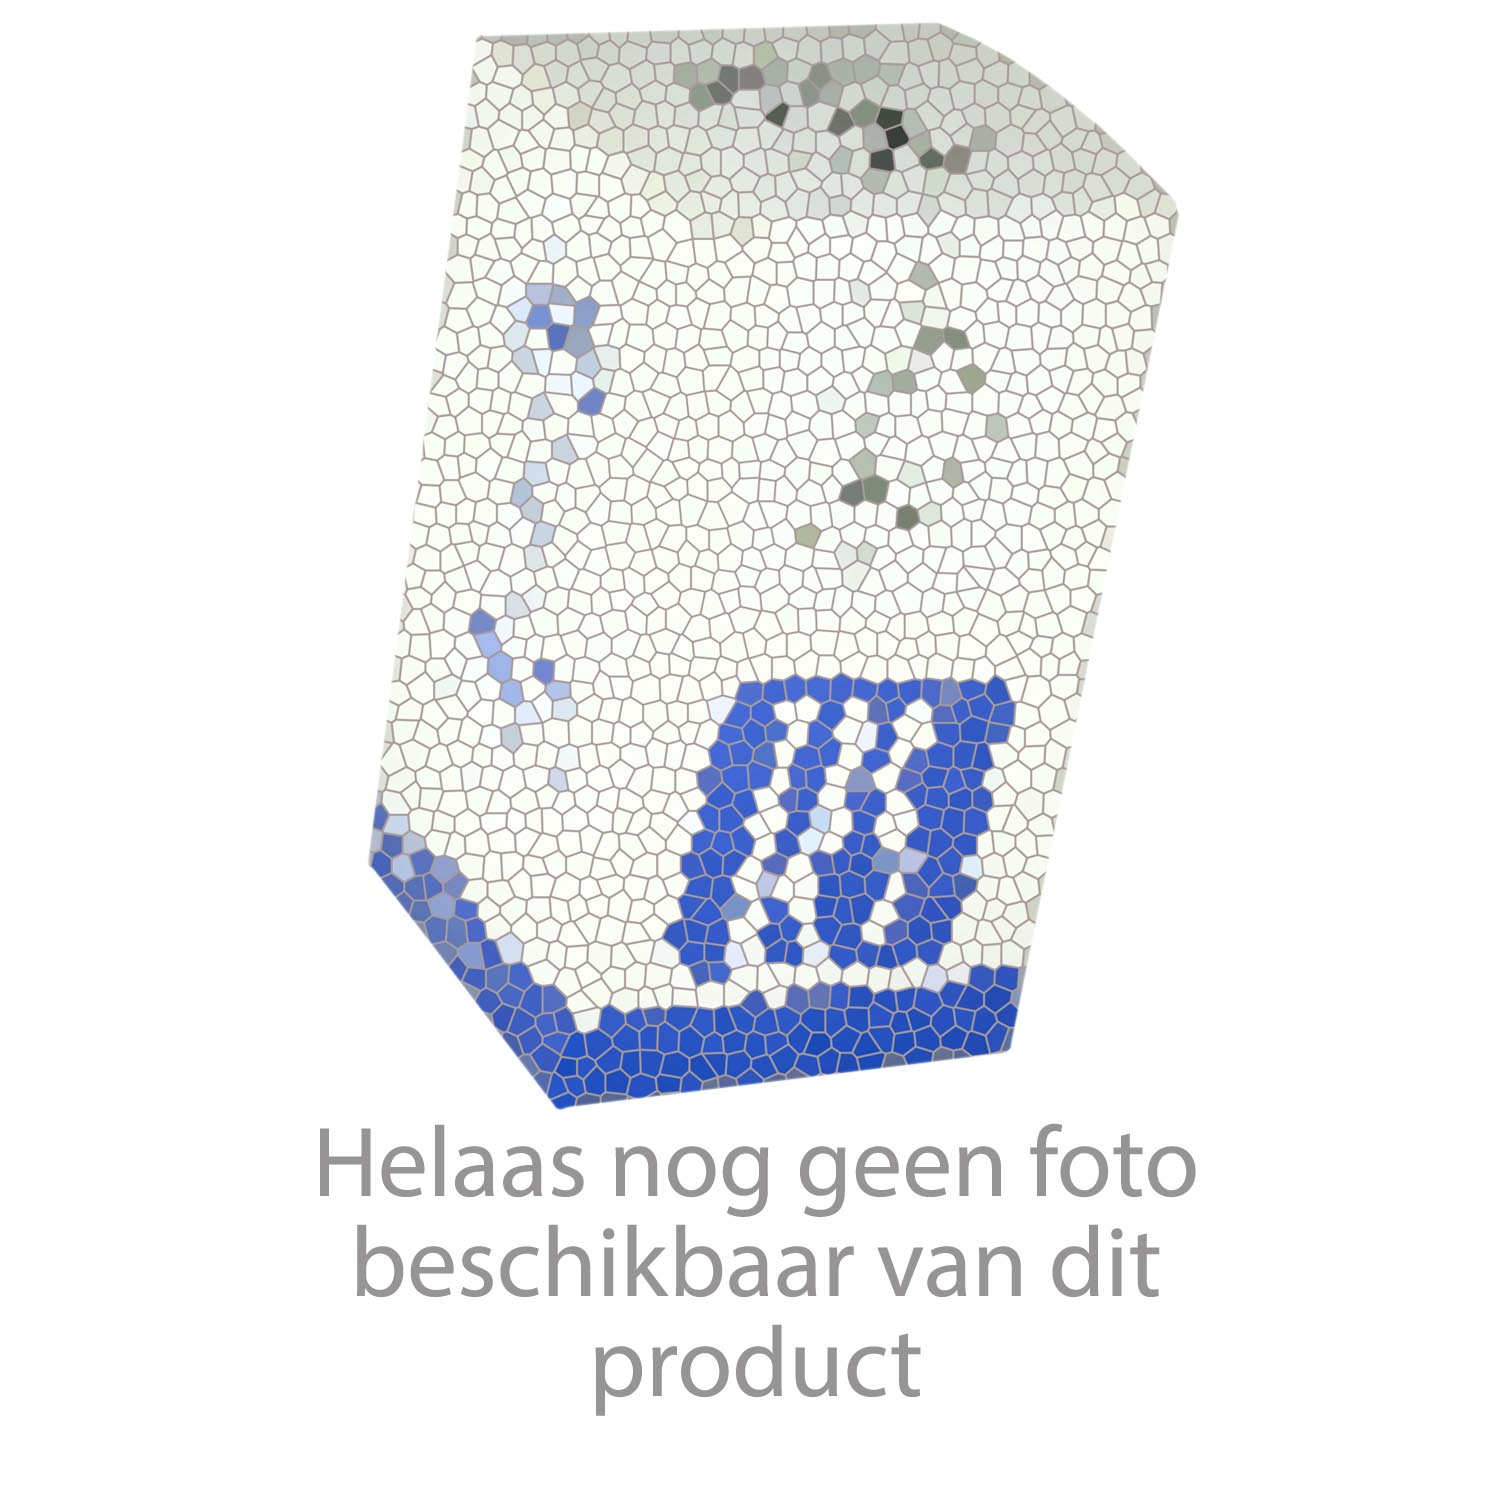 Grohe Onderdelen Allure Wastafelkraan Driegats wastafelmengkraan M-Size Artikelnummer 20188000